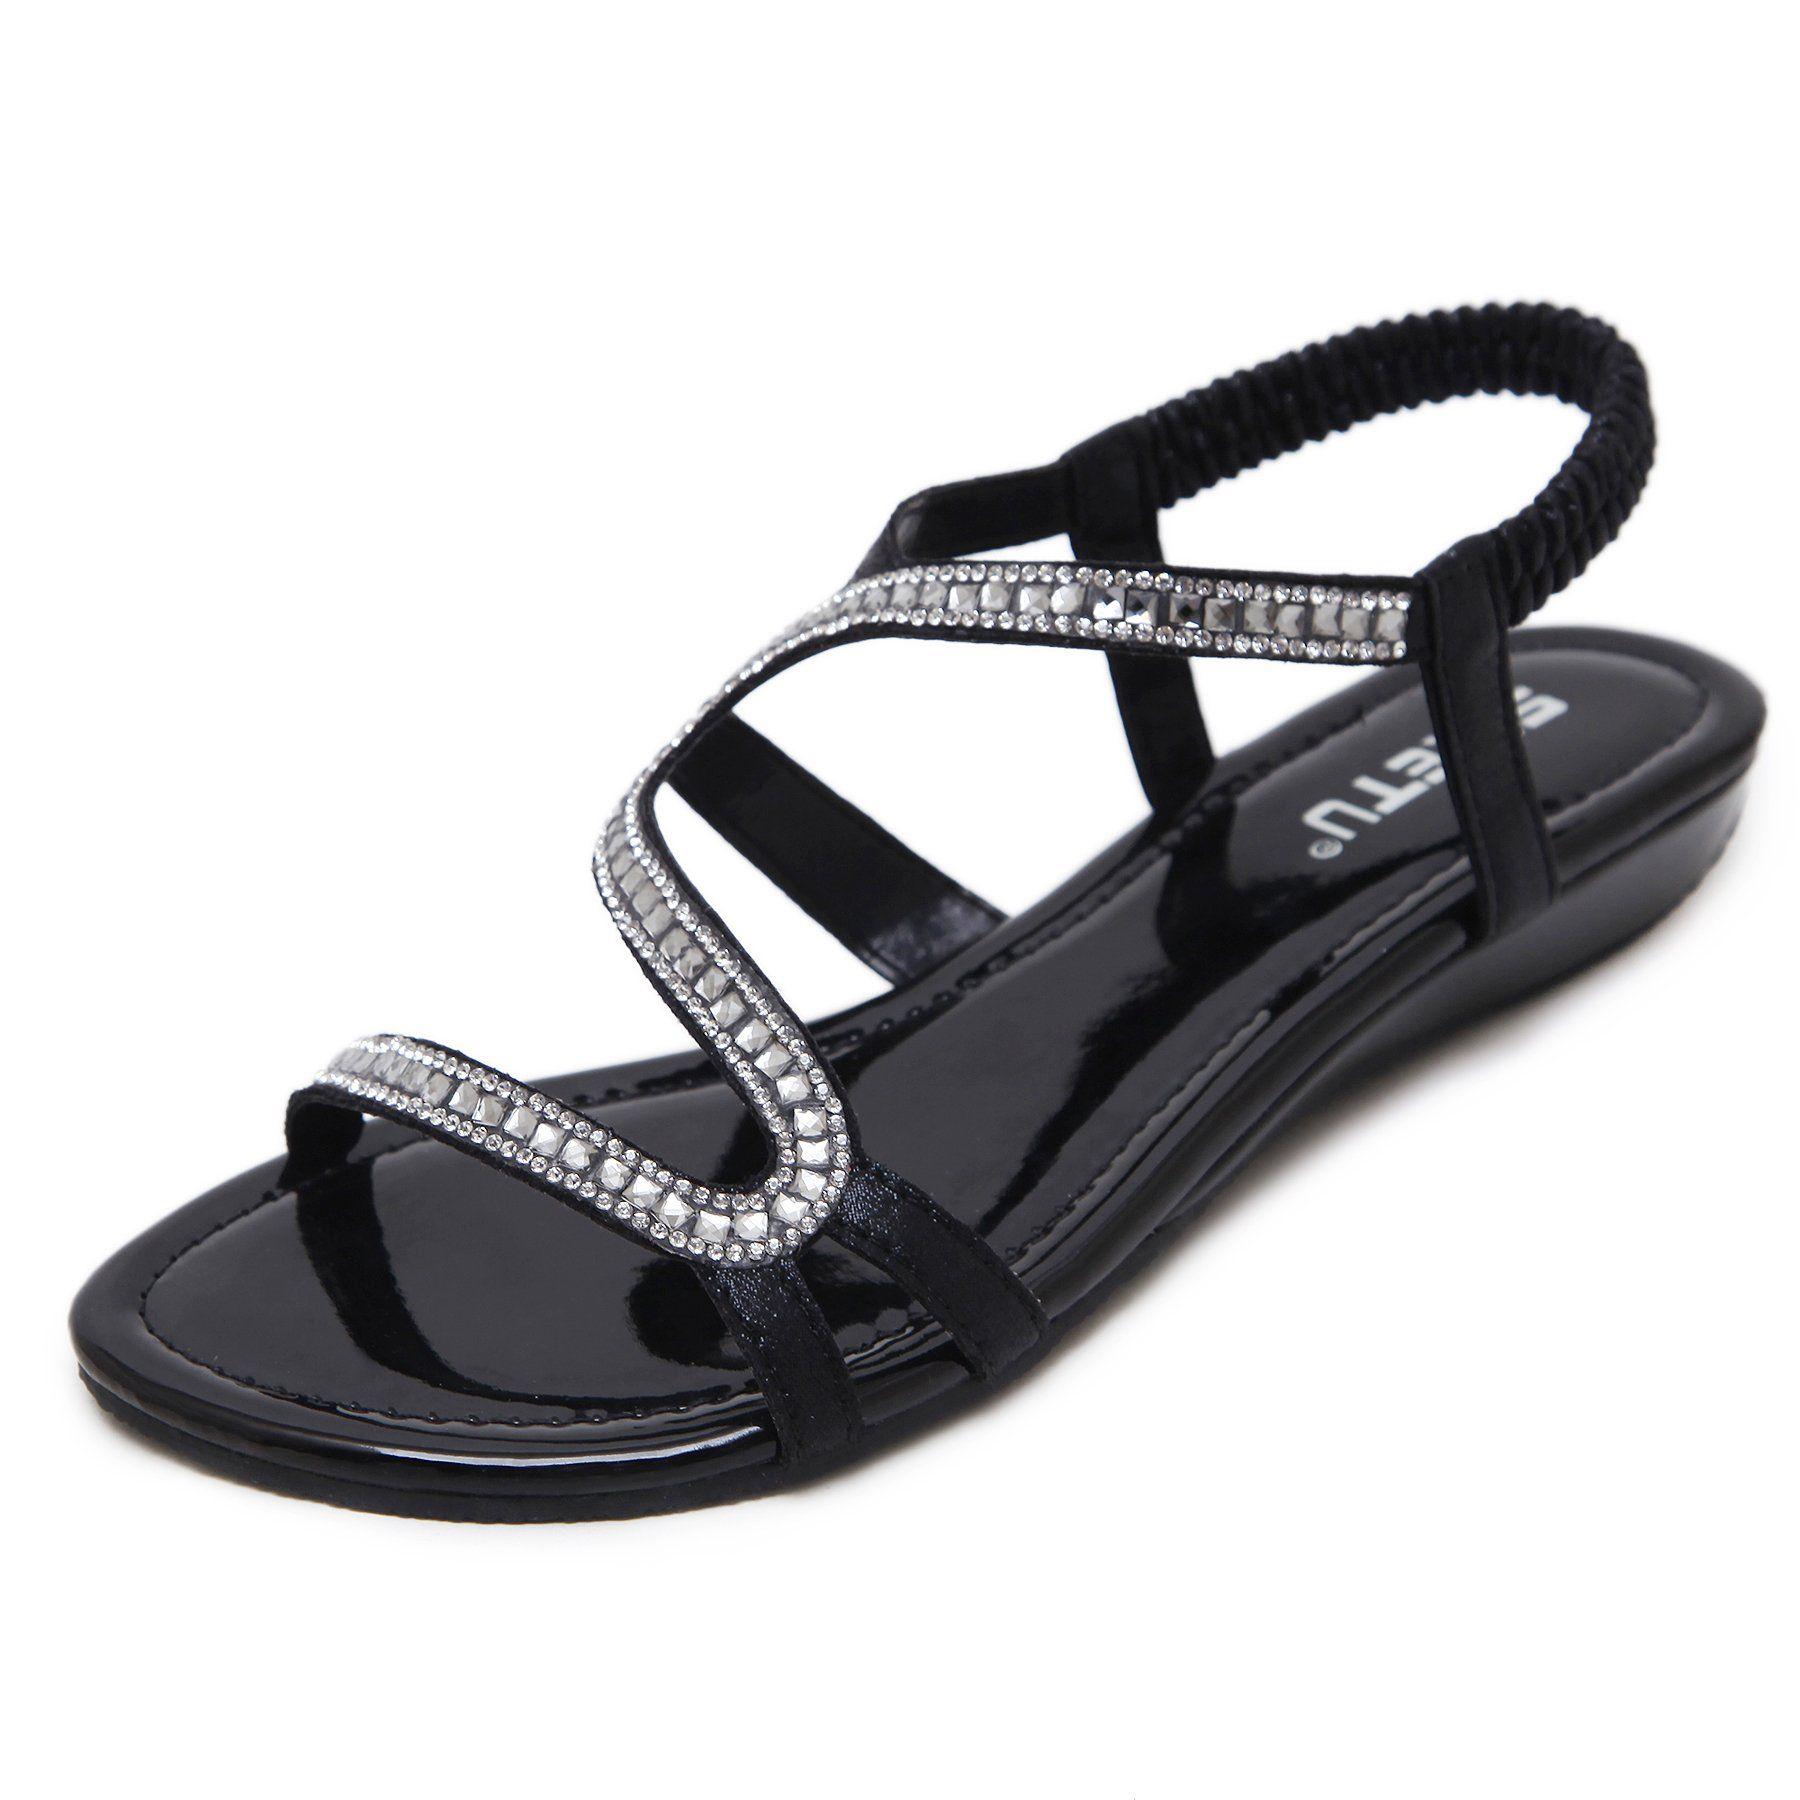 5357661e158577 Designer diamond design Female Summer Sandals Rhinestone Wedges Fashion Women  Sandals  dresses  womensclothing